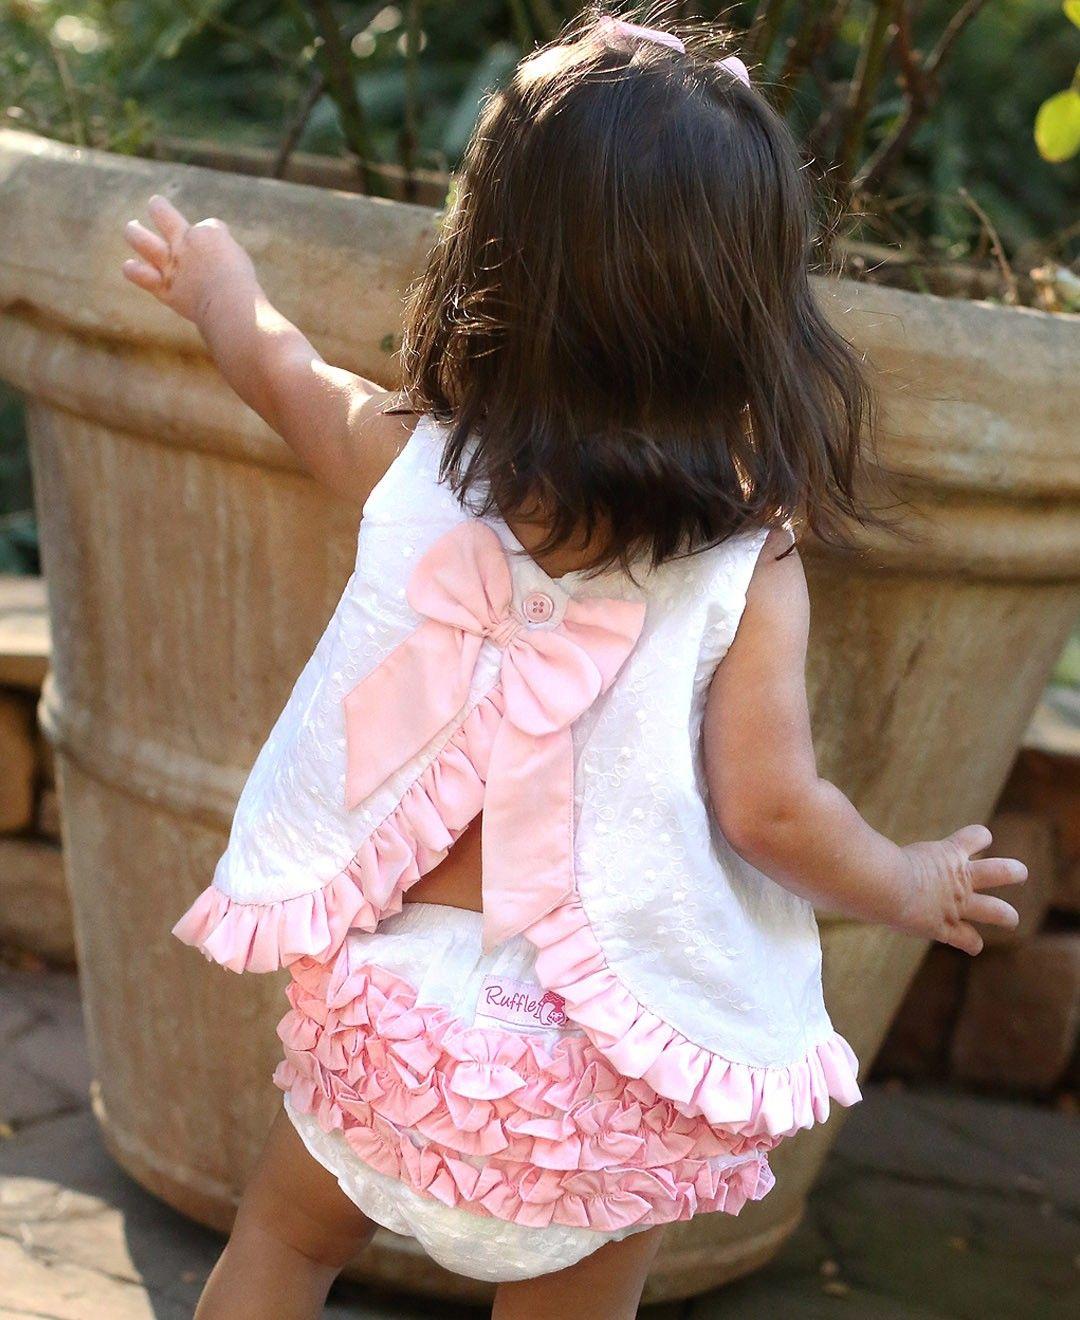 RuffleButts - Swiss Dot Bow-Back Swing Top Baby Boutique Clothing d69c1ecff